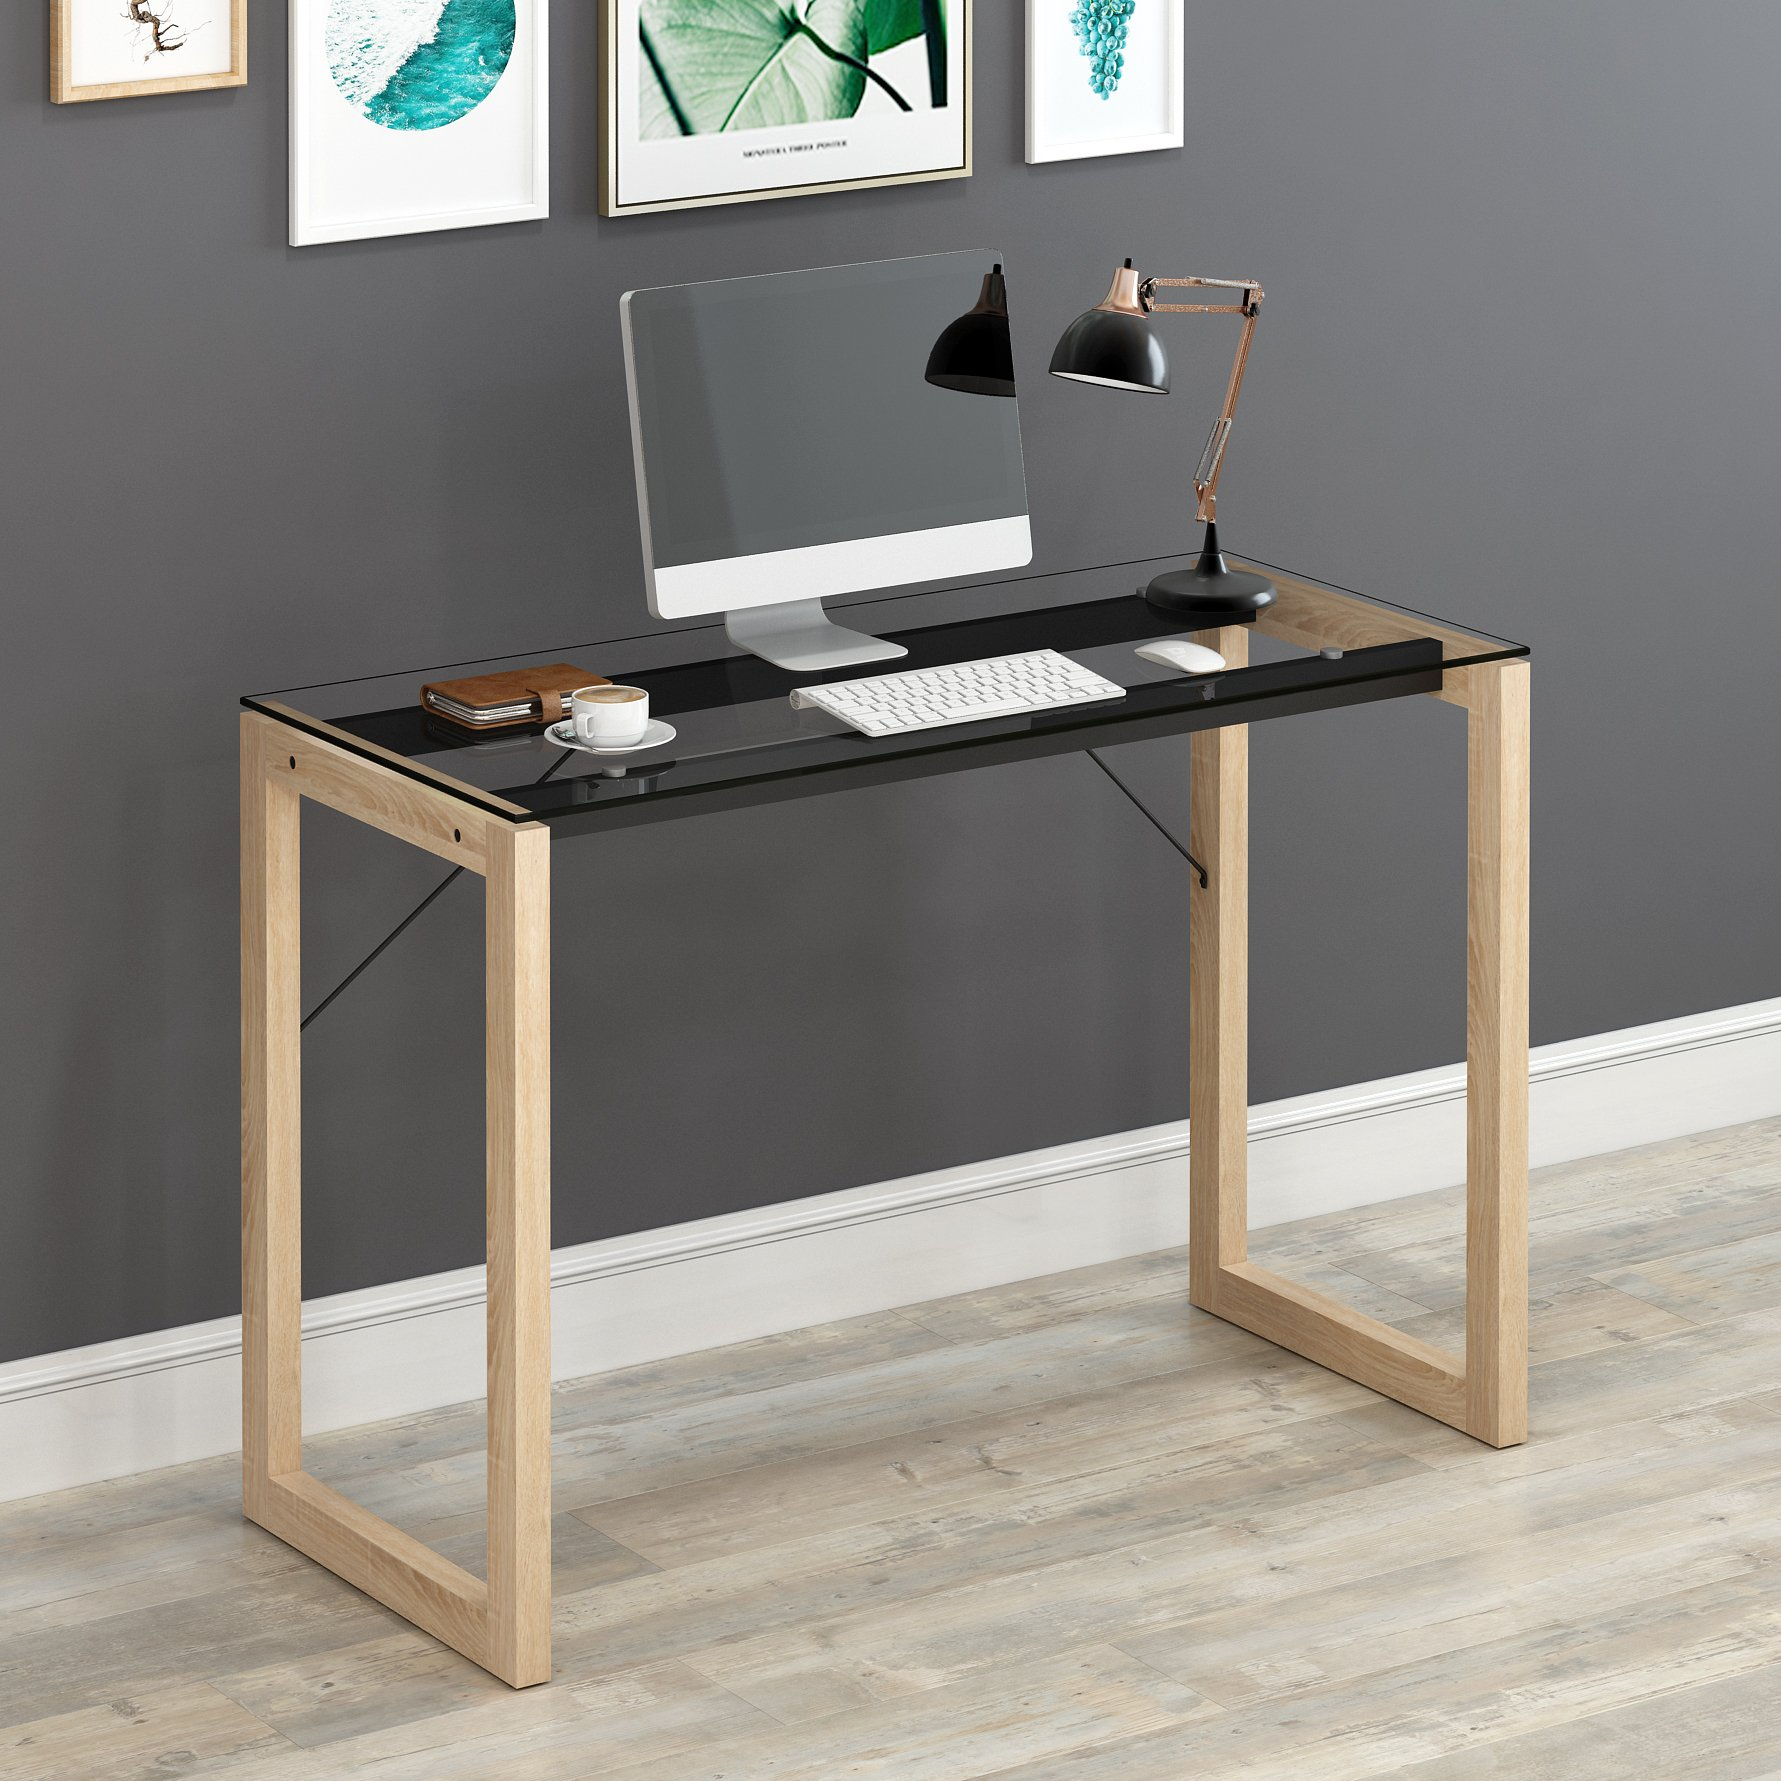 elegant clear tempered glass top computer desk wood frame writing rh ebay co uk glass writing desk ikea glass drawing desk